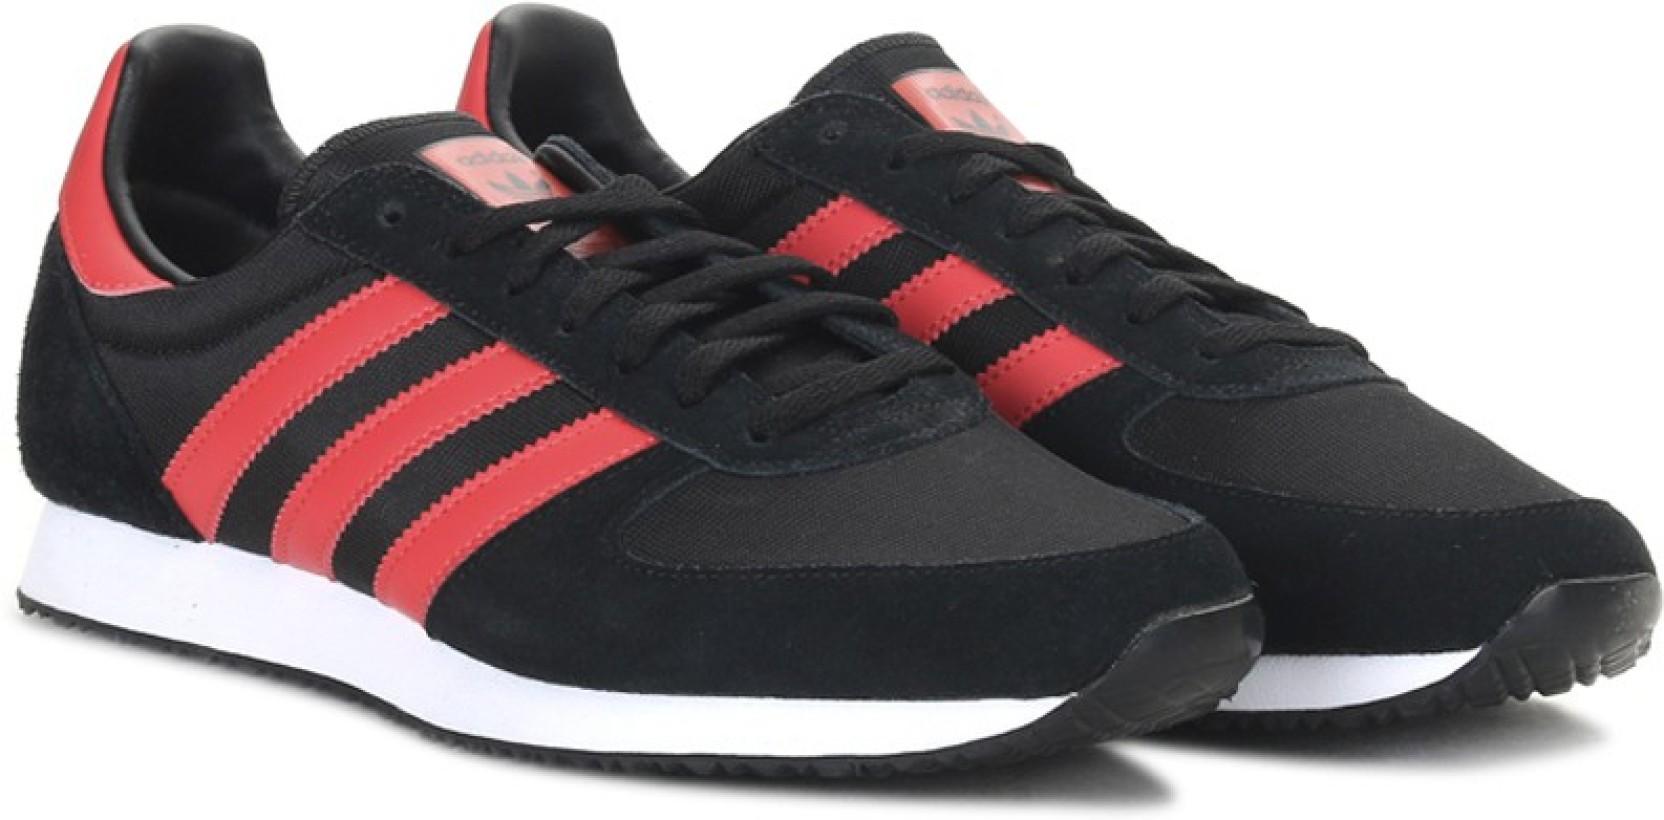 427501c1e777b ADIDAS ORIGINALS ZX RACER Sneakers For Men - Buy CBLACK RED FTWWHT ...